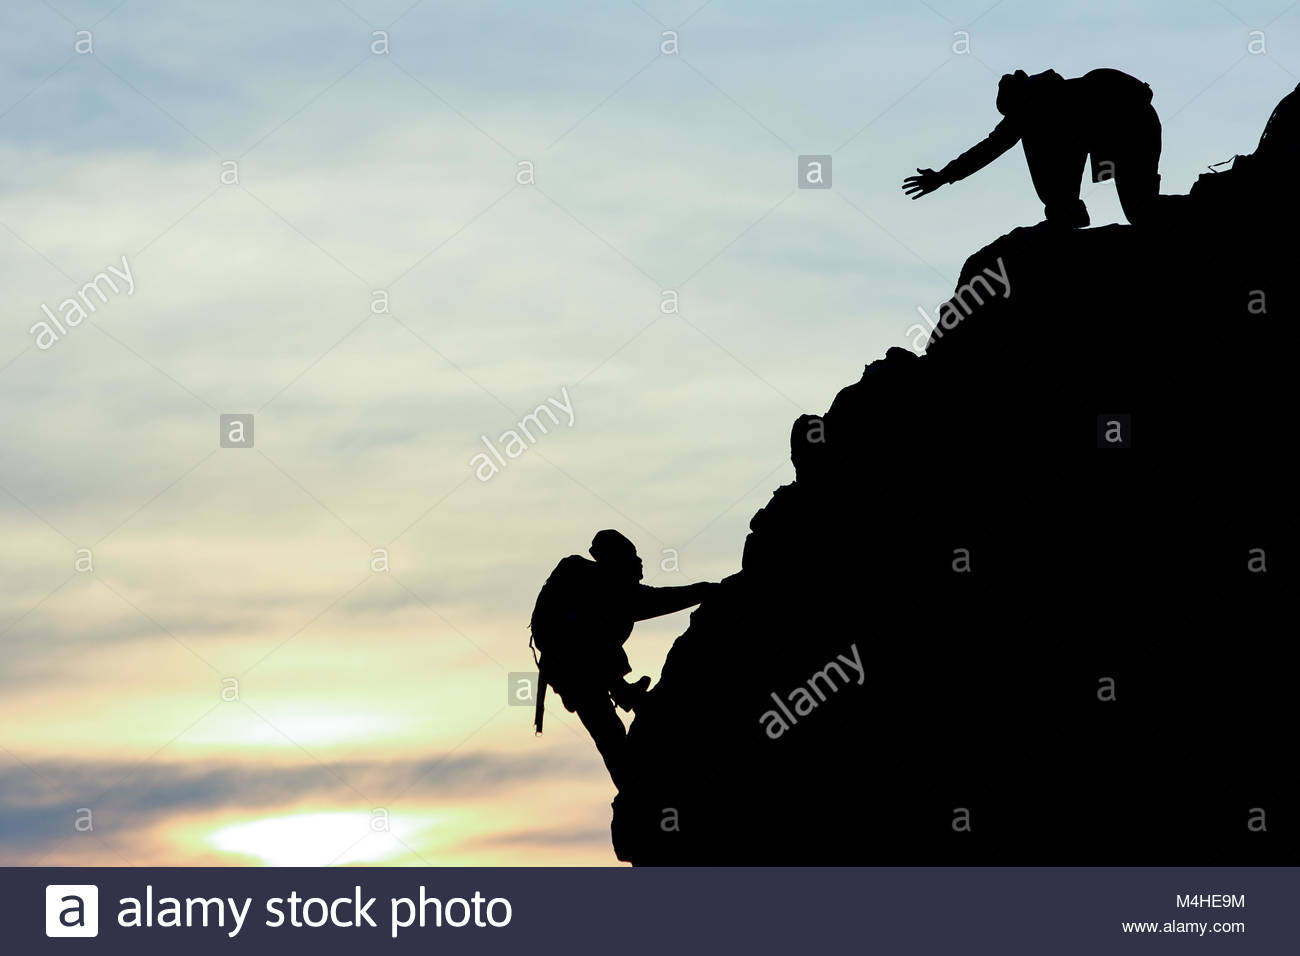 Aide et support d'alpinisme Photo Stock